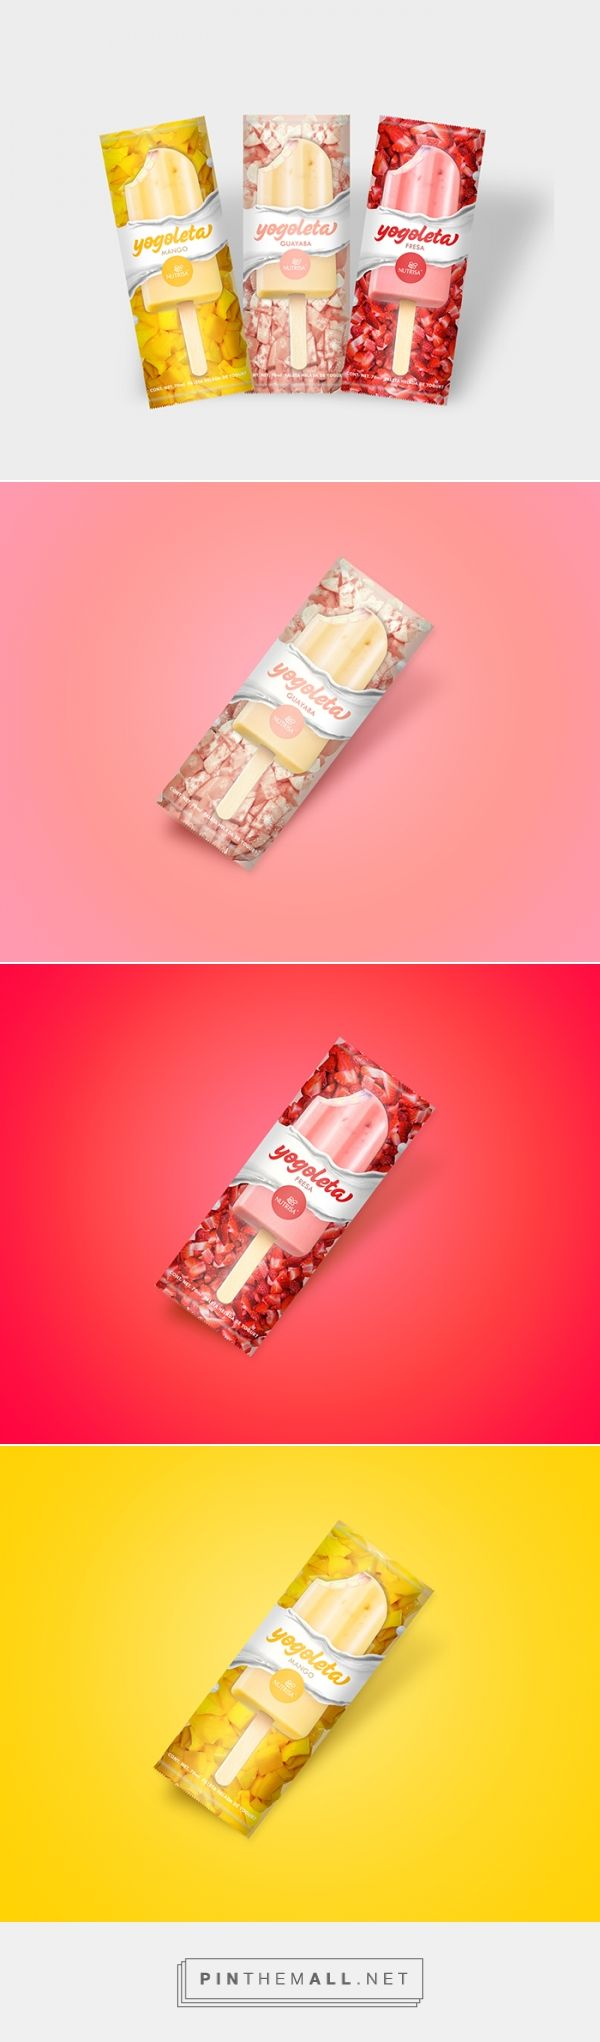 Yogoleta yogurt ice cream bars by Karen Santiago. Source: Daily Packaging Inspiration. Pin curate by #SFields99 #packaging #design